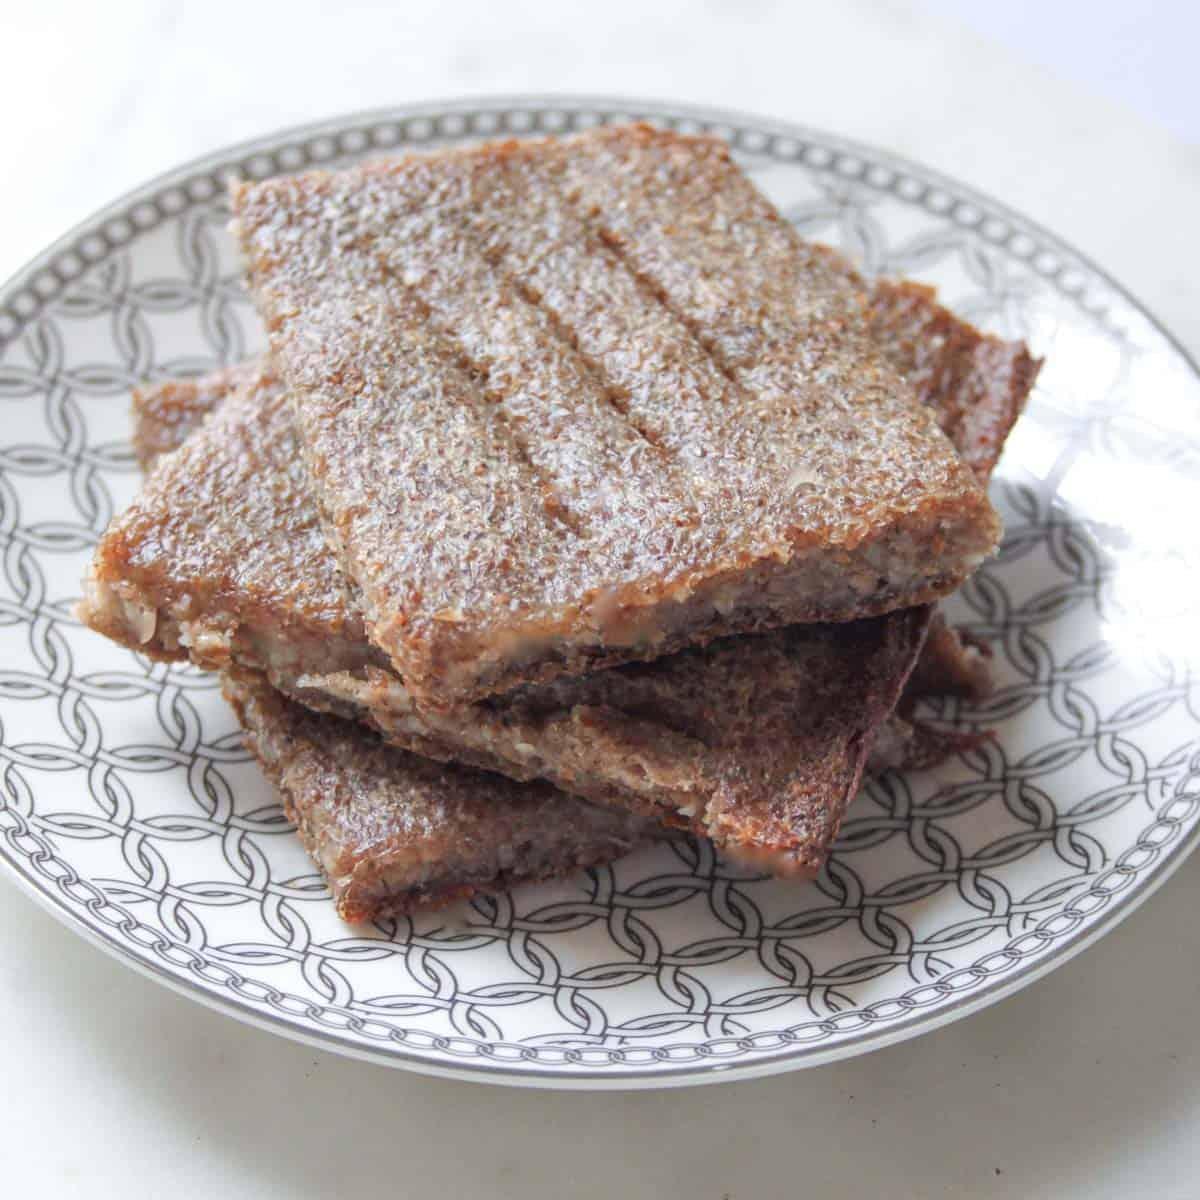 baked kibbeh on a plate